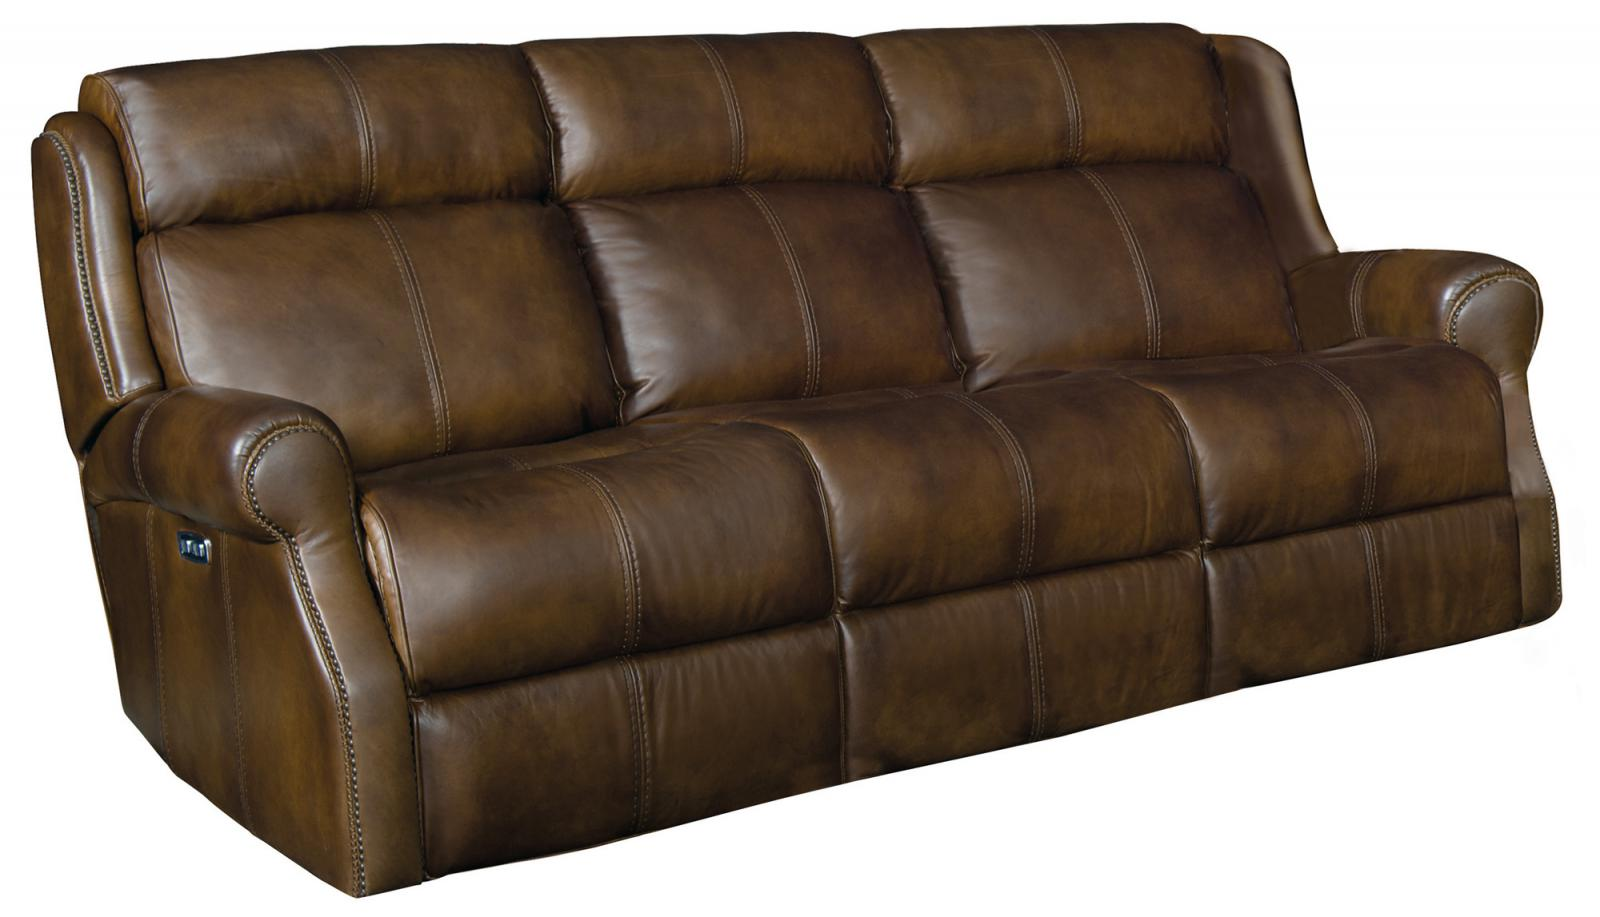 Maddux Reclining Sofa Da6ic8z2